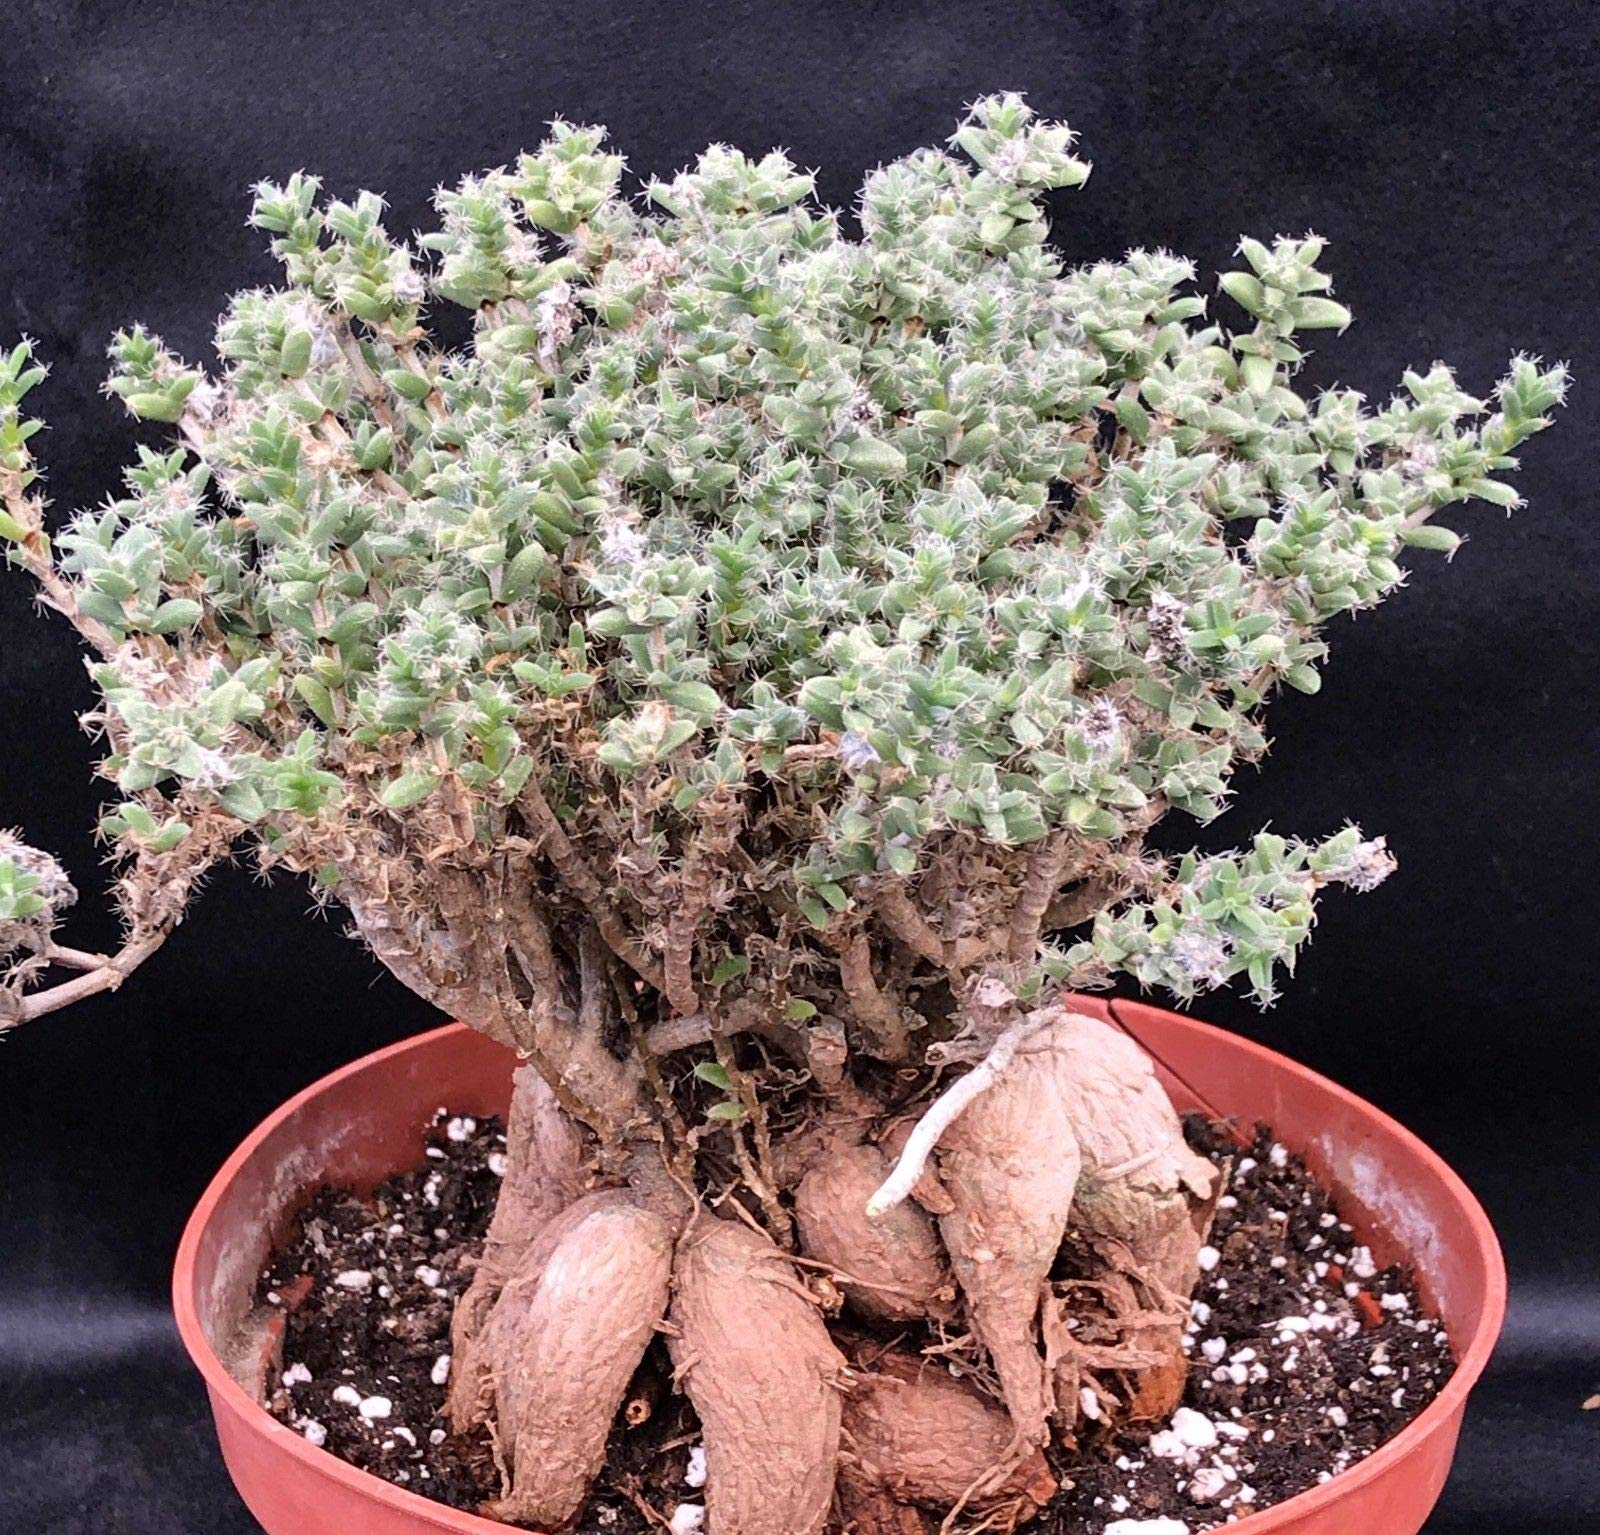 Trichodiadema Bulbosum Caudex Succulent Ice Plant African Bonsai Houseplant #DV01 by mplant (Image #1)